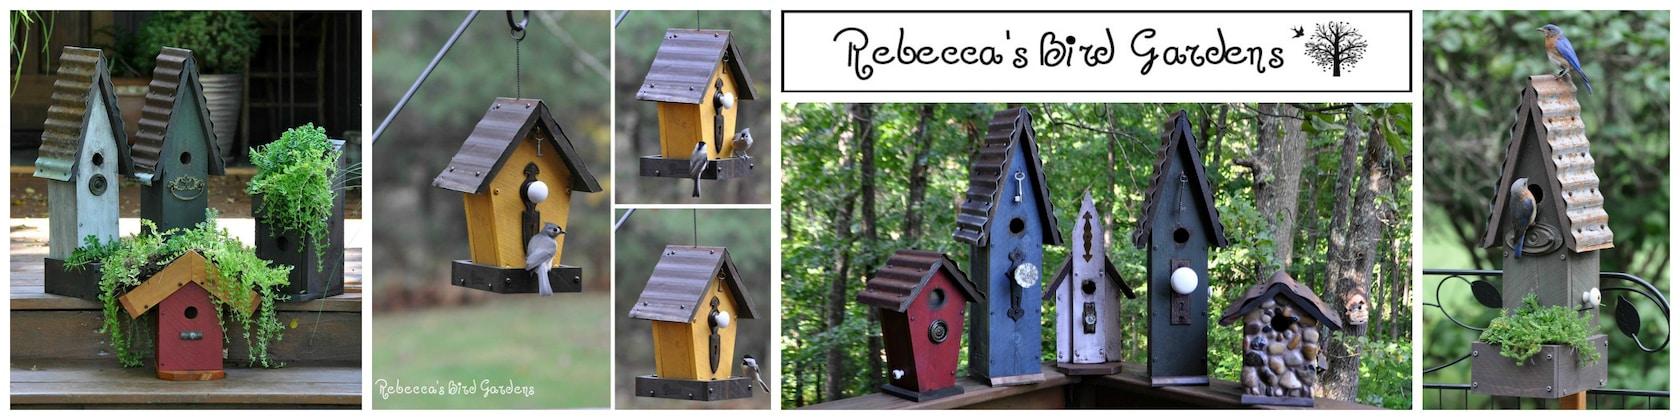 Rebecca\'s Bird Gardens by RebeccasBirdGardens on Etsy